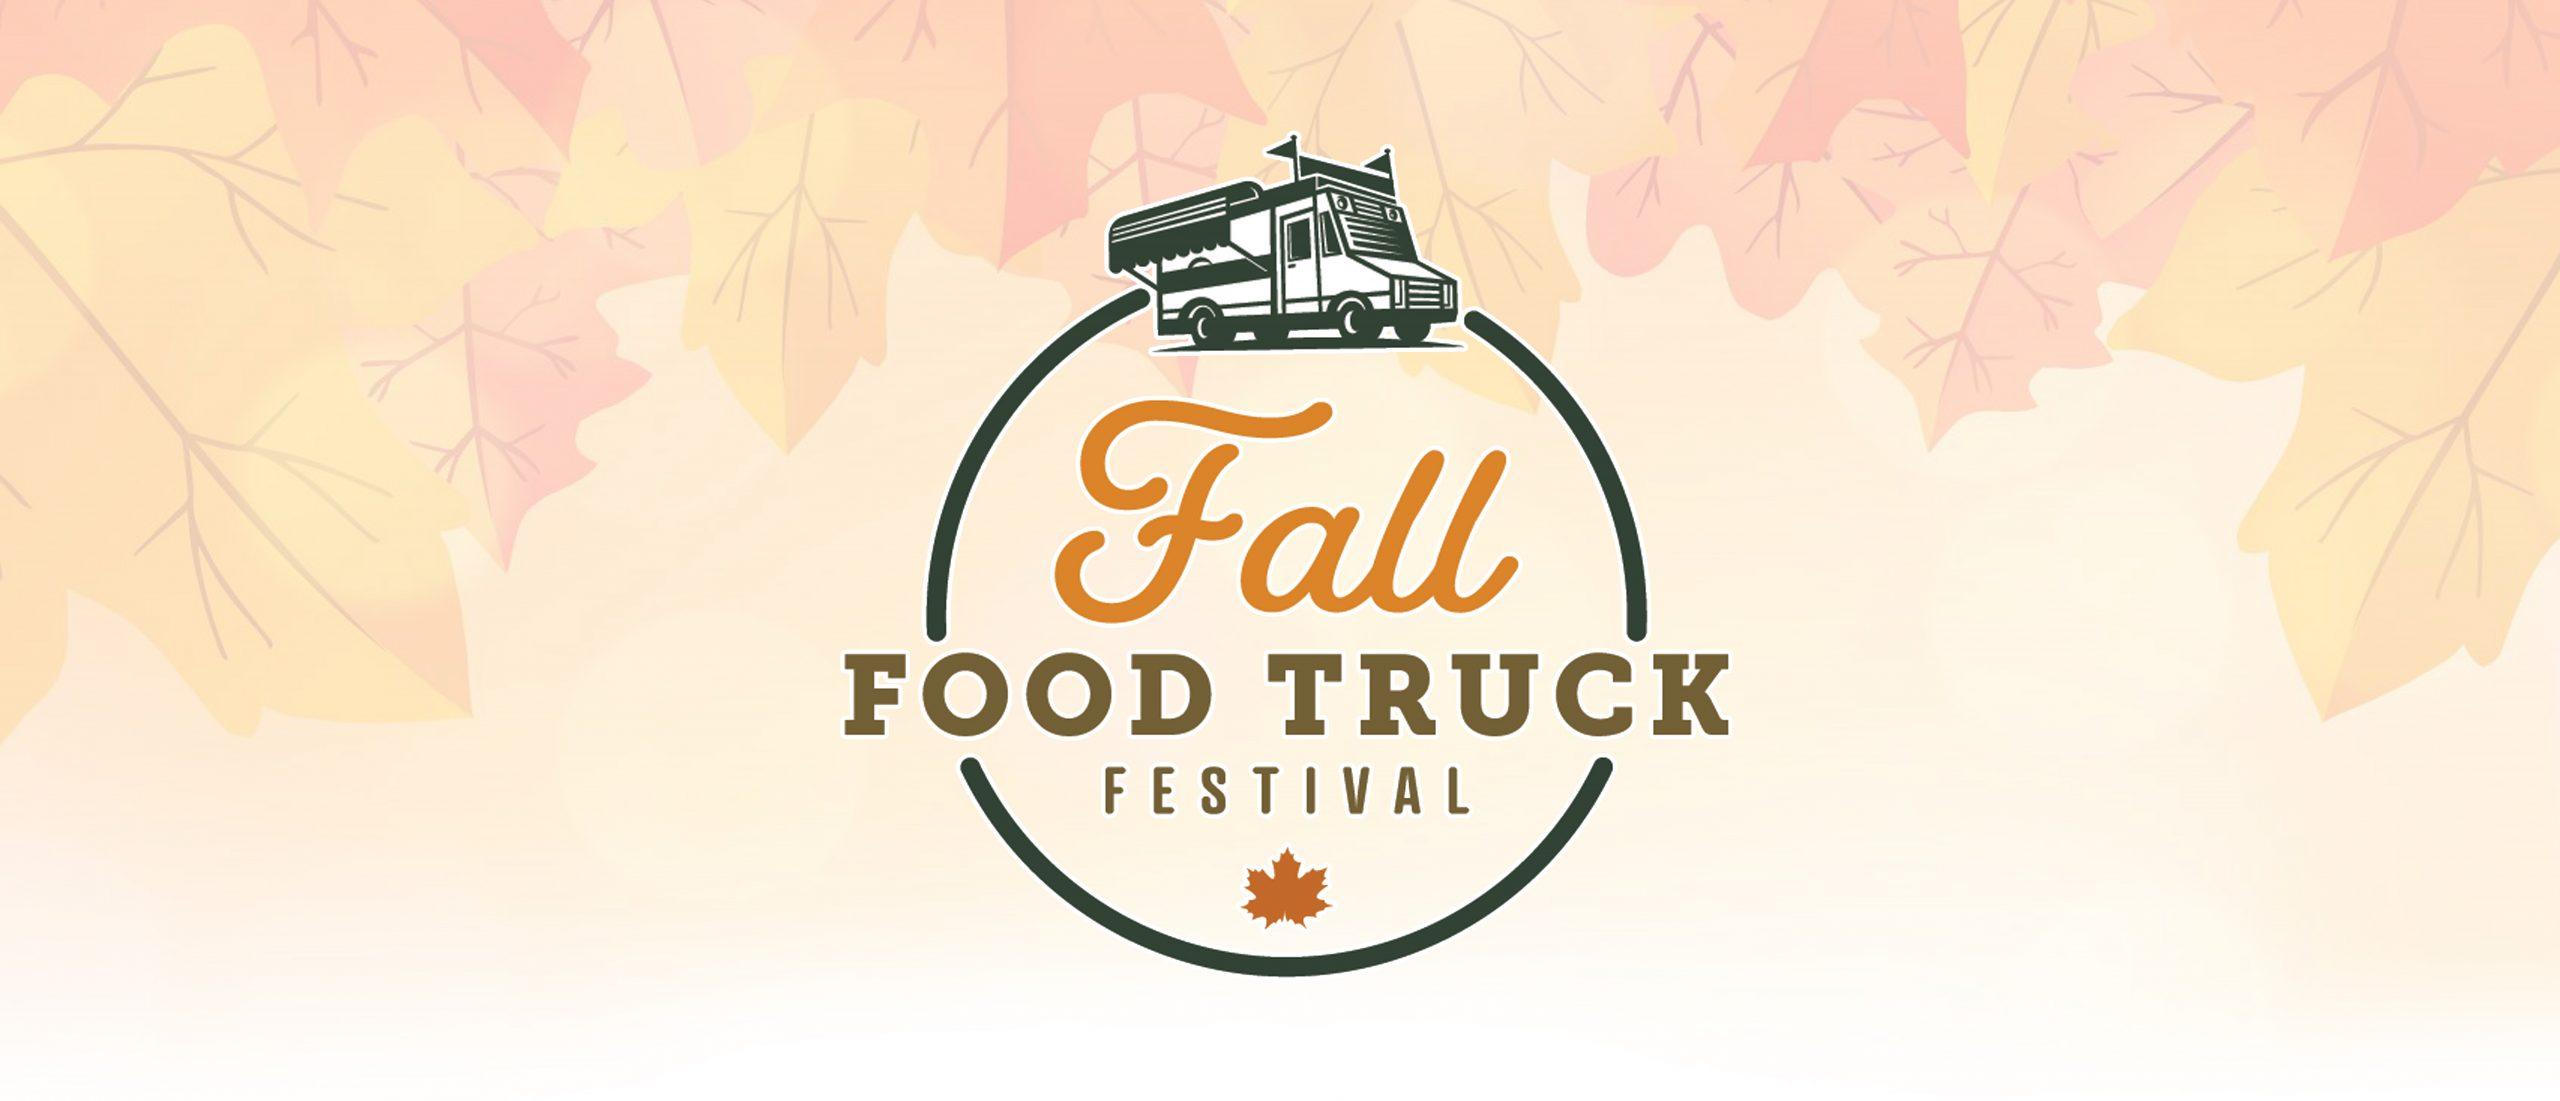 Fall Food Truck Festival header photo